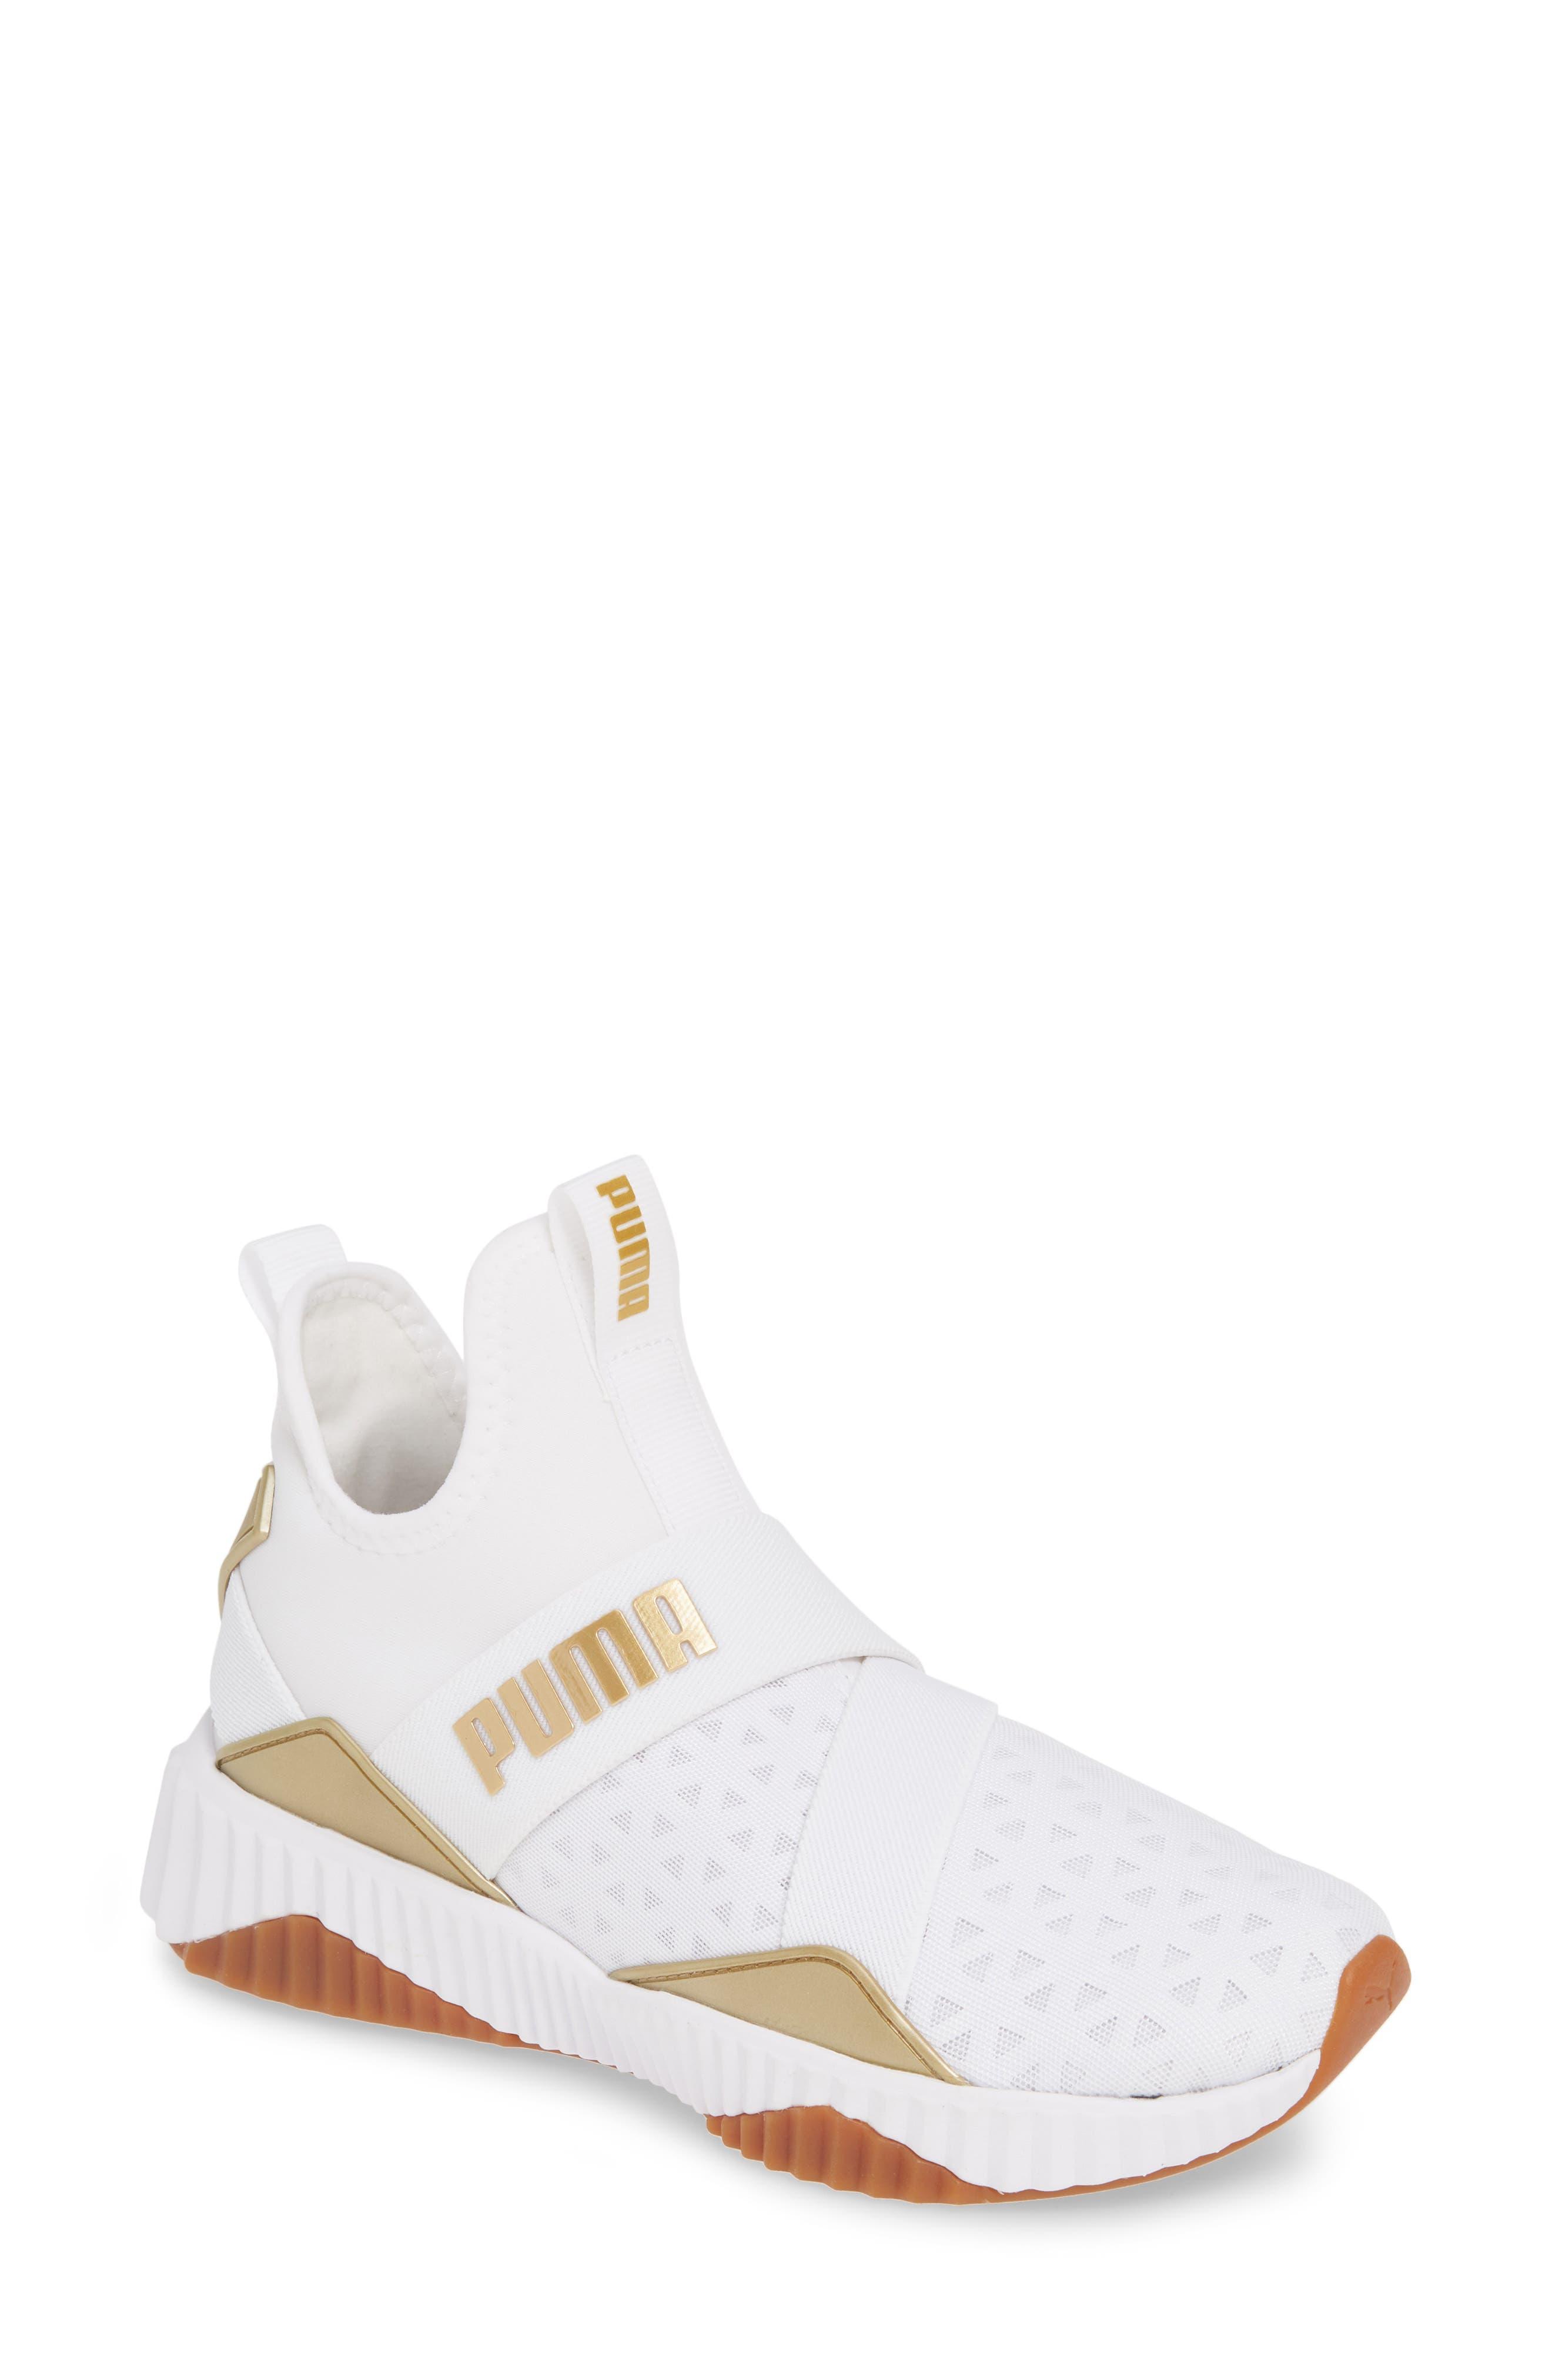 Puma Defy Mid Sparkle Training Shoe, White